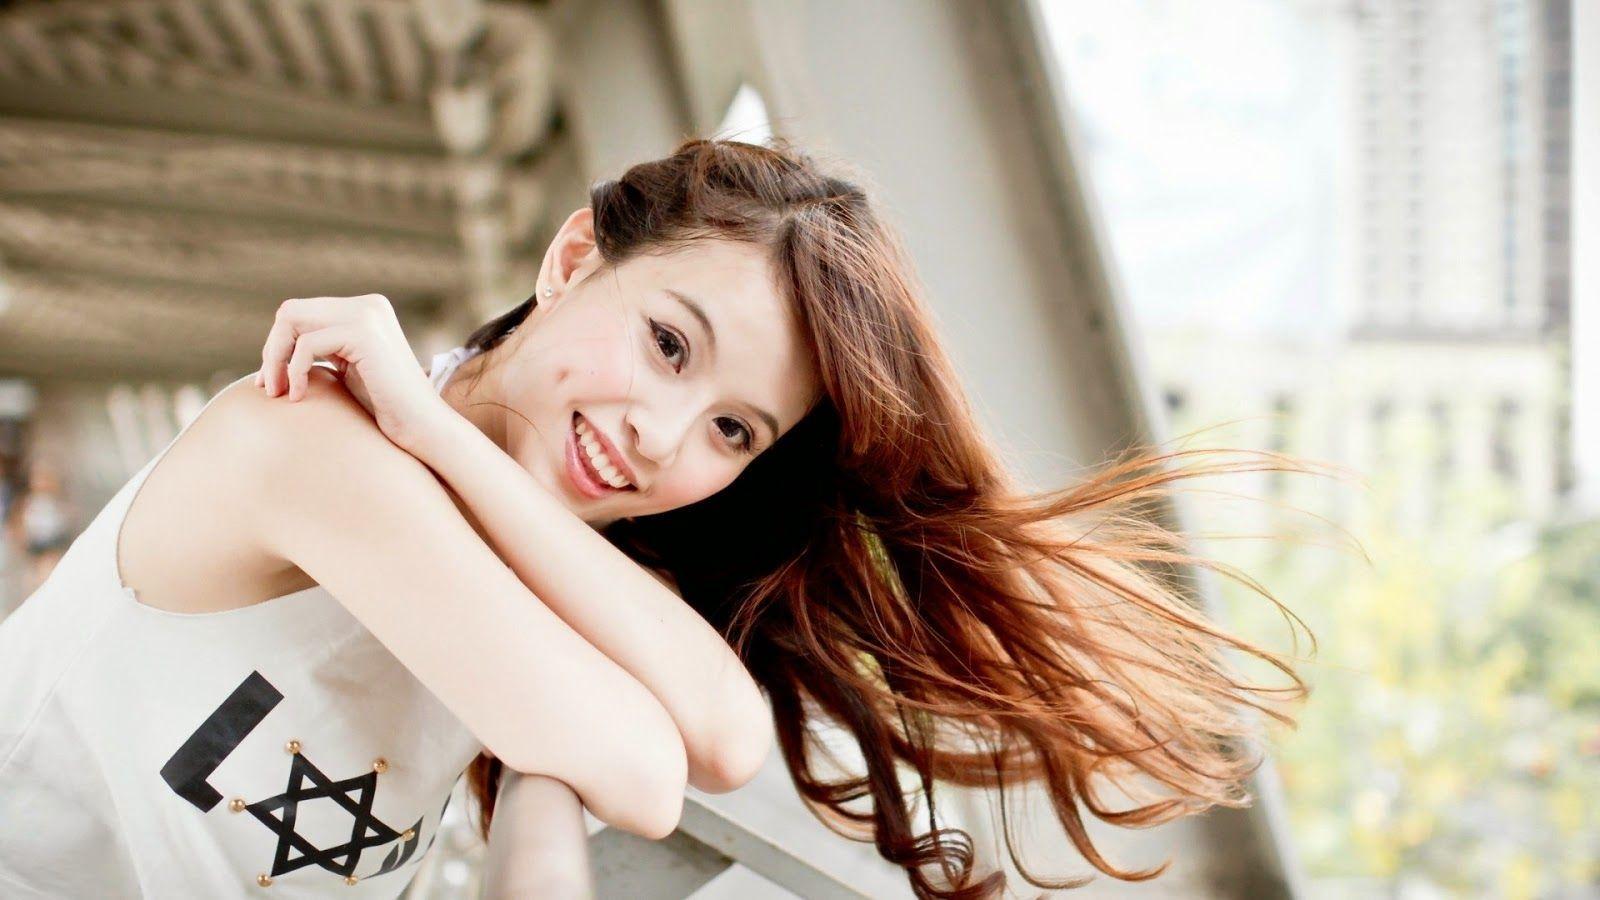 Best 487 Latest WhatsApp DP - Girls, Life, Love